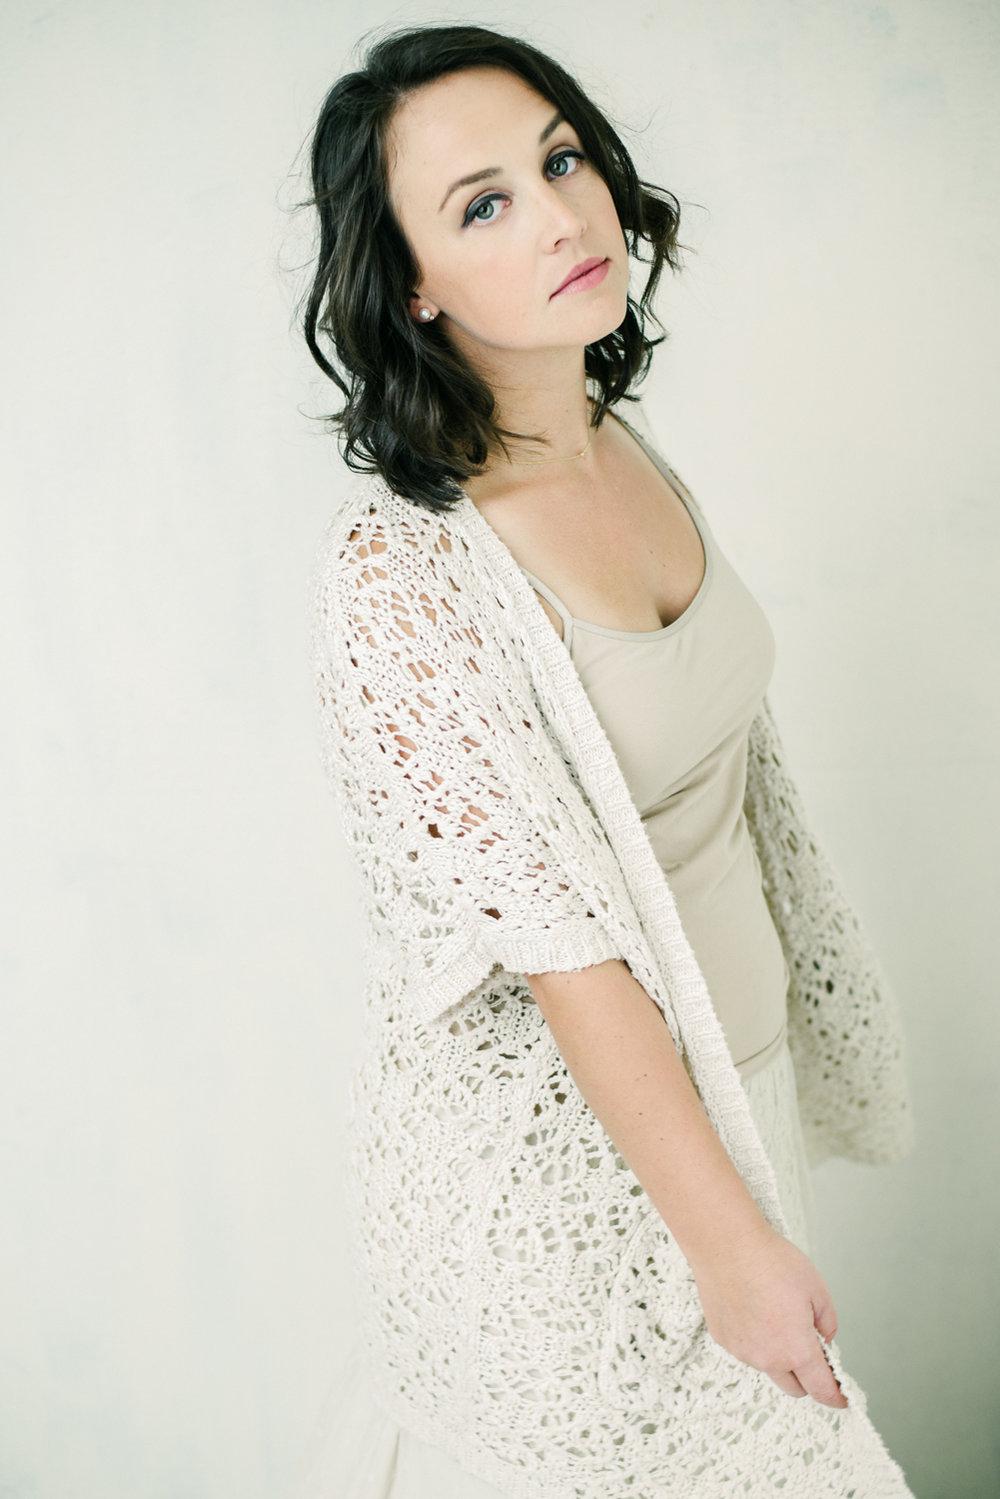 Allison | the lost | dream | explore | create | inspire | rawbeauty | beauty photographer | san diego-3.jpg